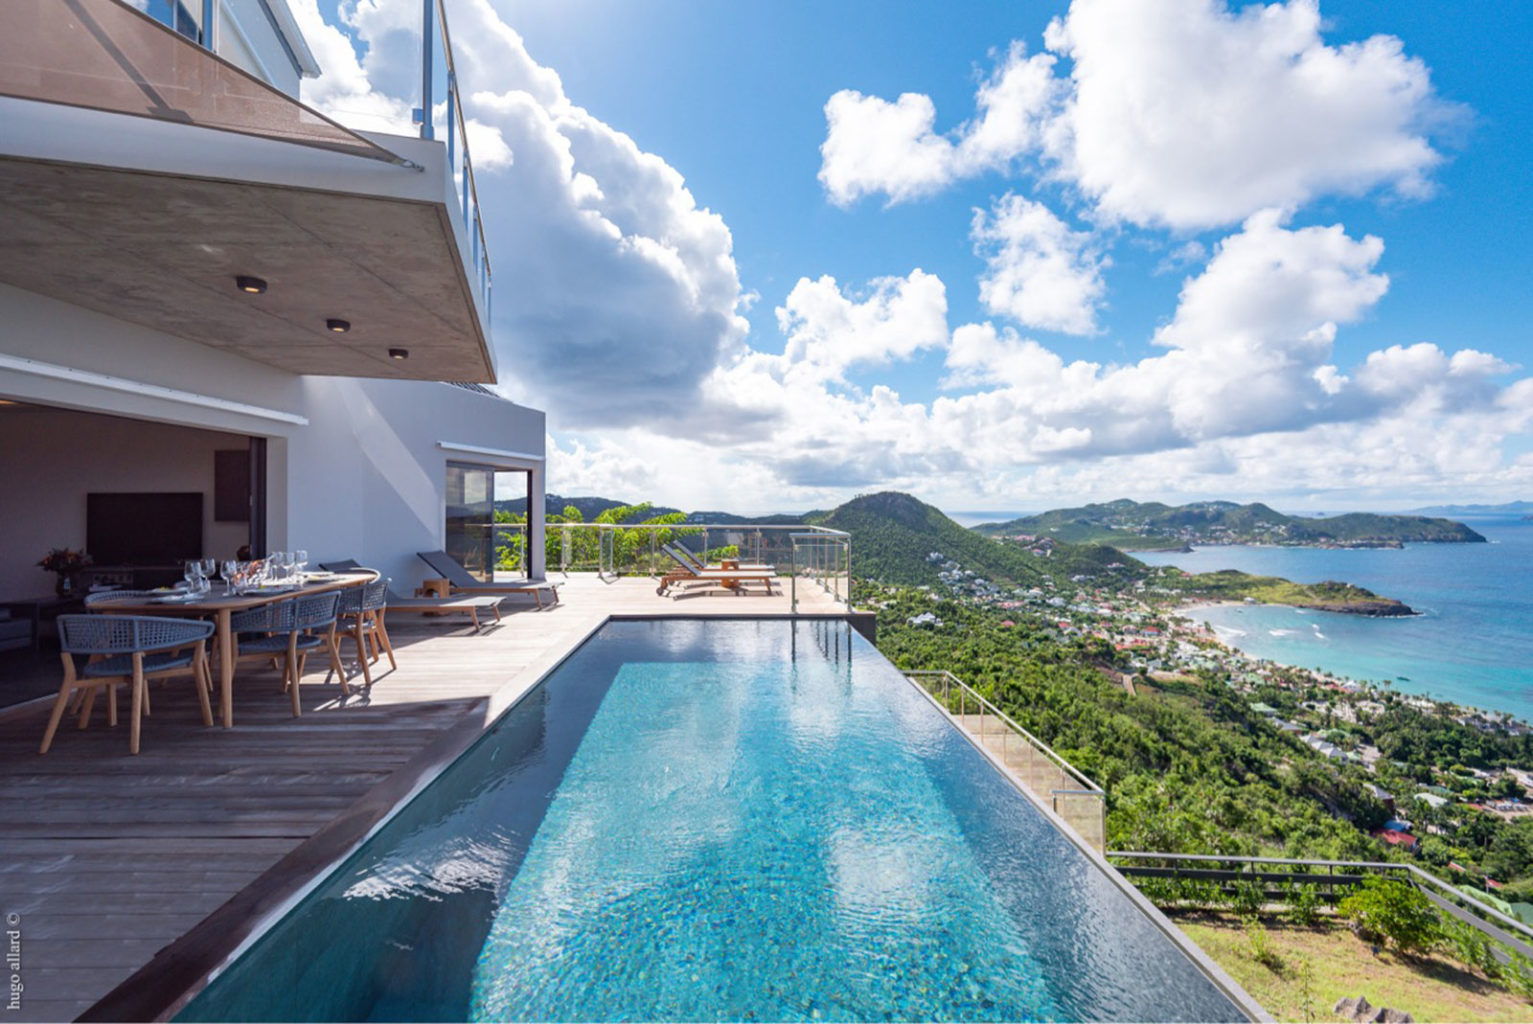 Villa Golden - 2 bedroom villa for rent St Barth Vitet with Gym room - Swimming pool